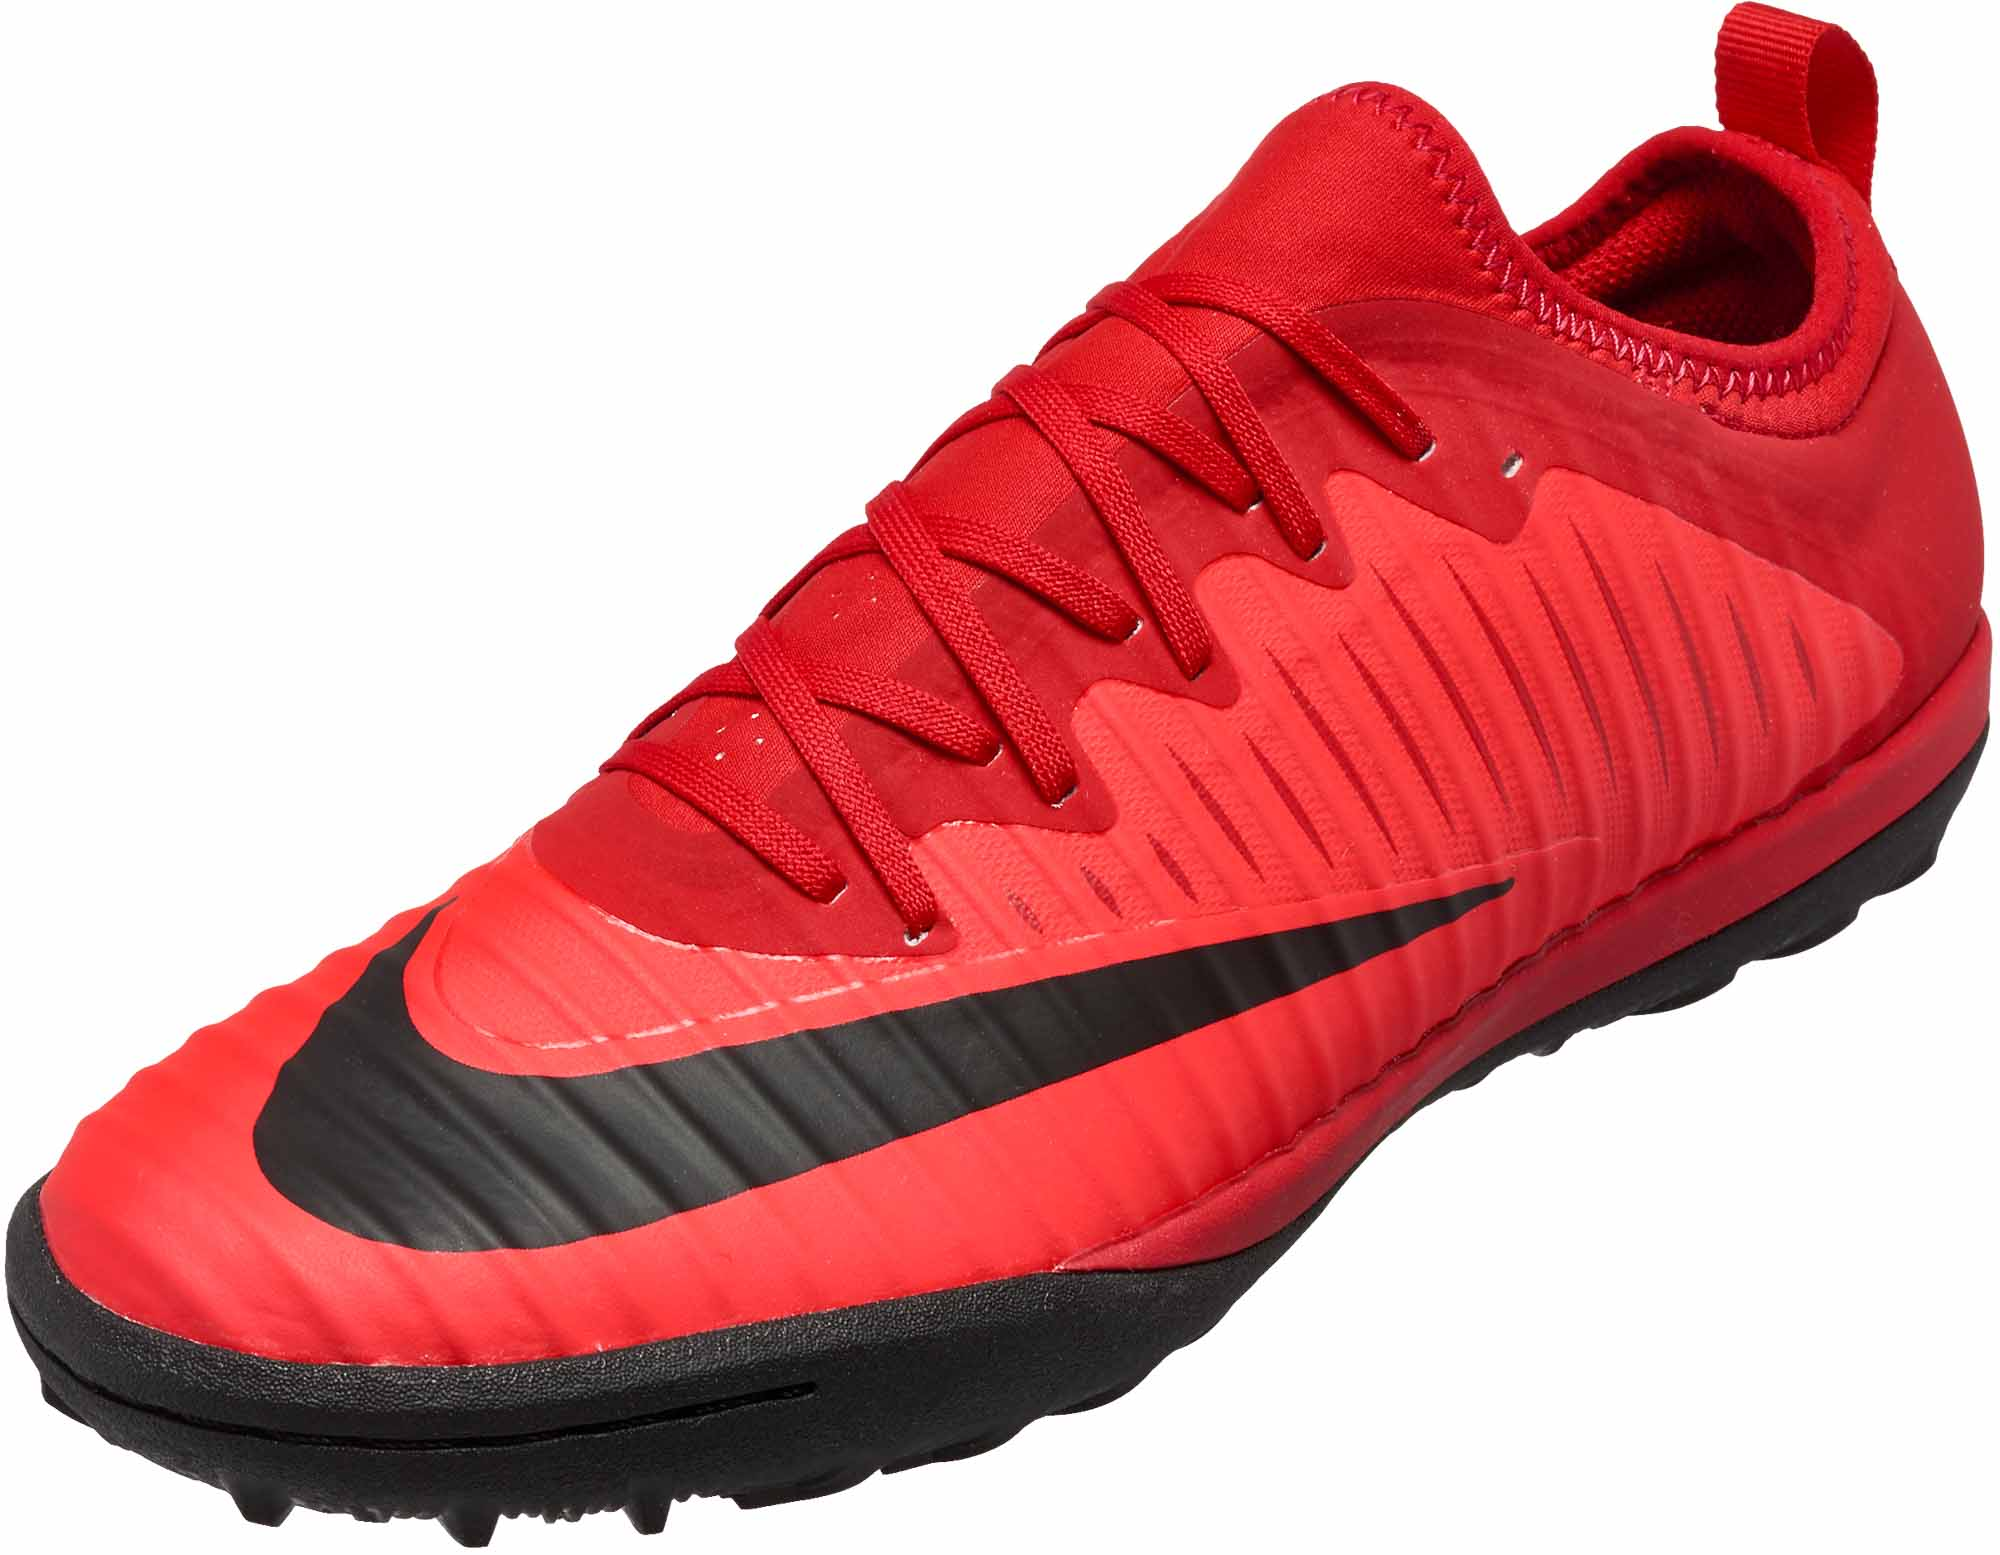 info for dcc1d 729e2 Nike MercurialX Finale II TF – University Red/Black